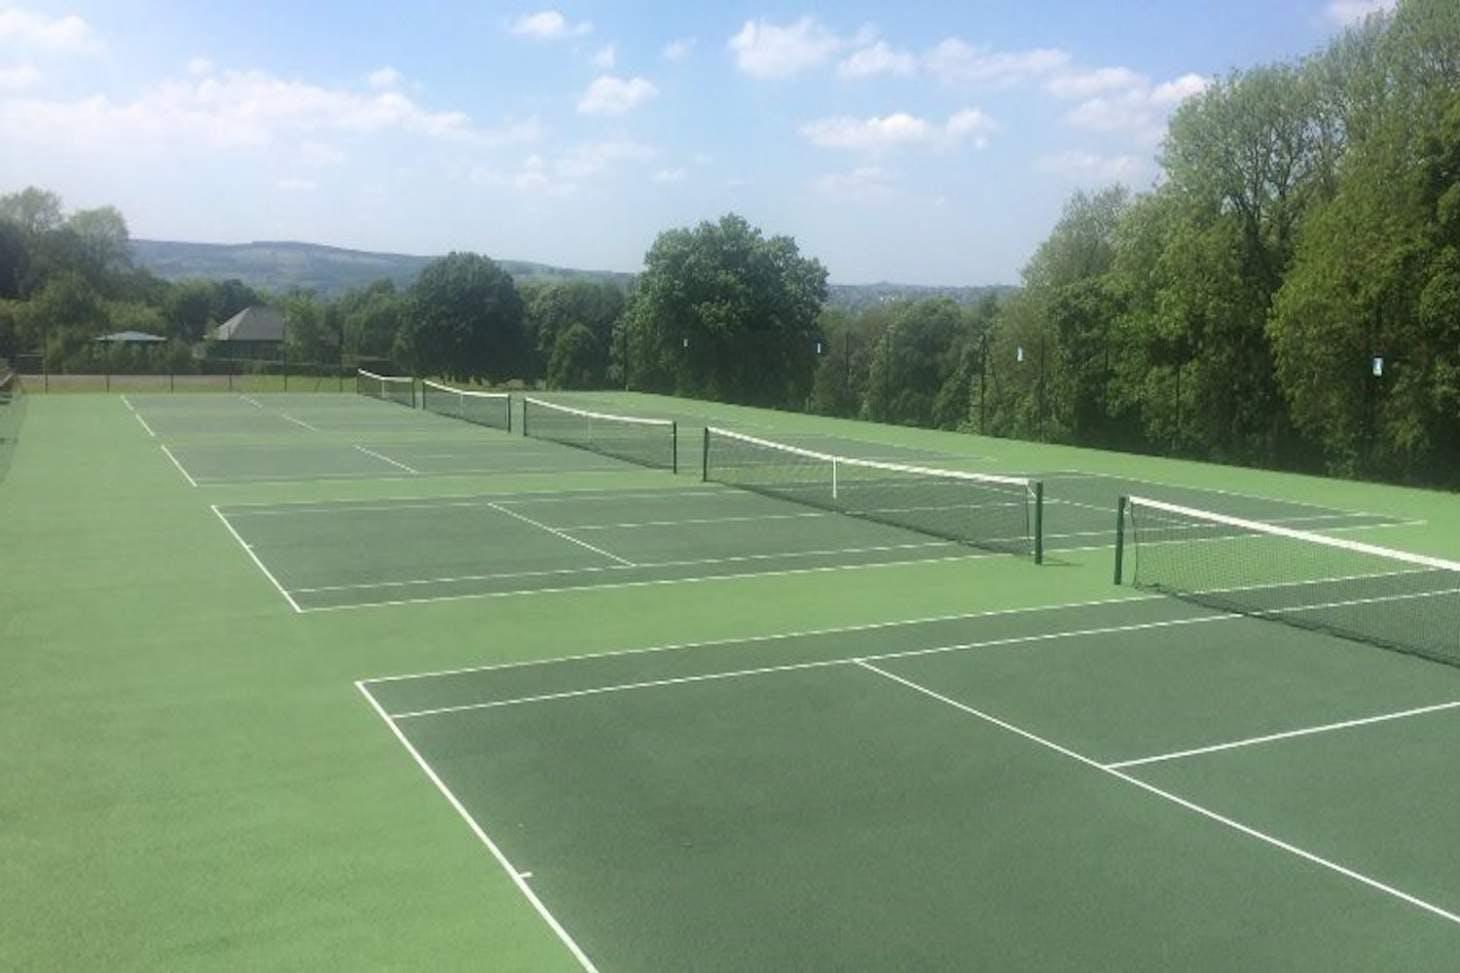 Graves Park Outdoor | Hard (macadam) tennis court